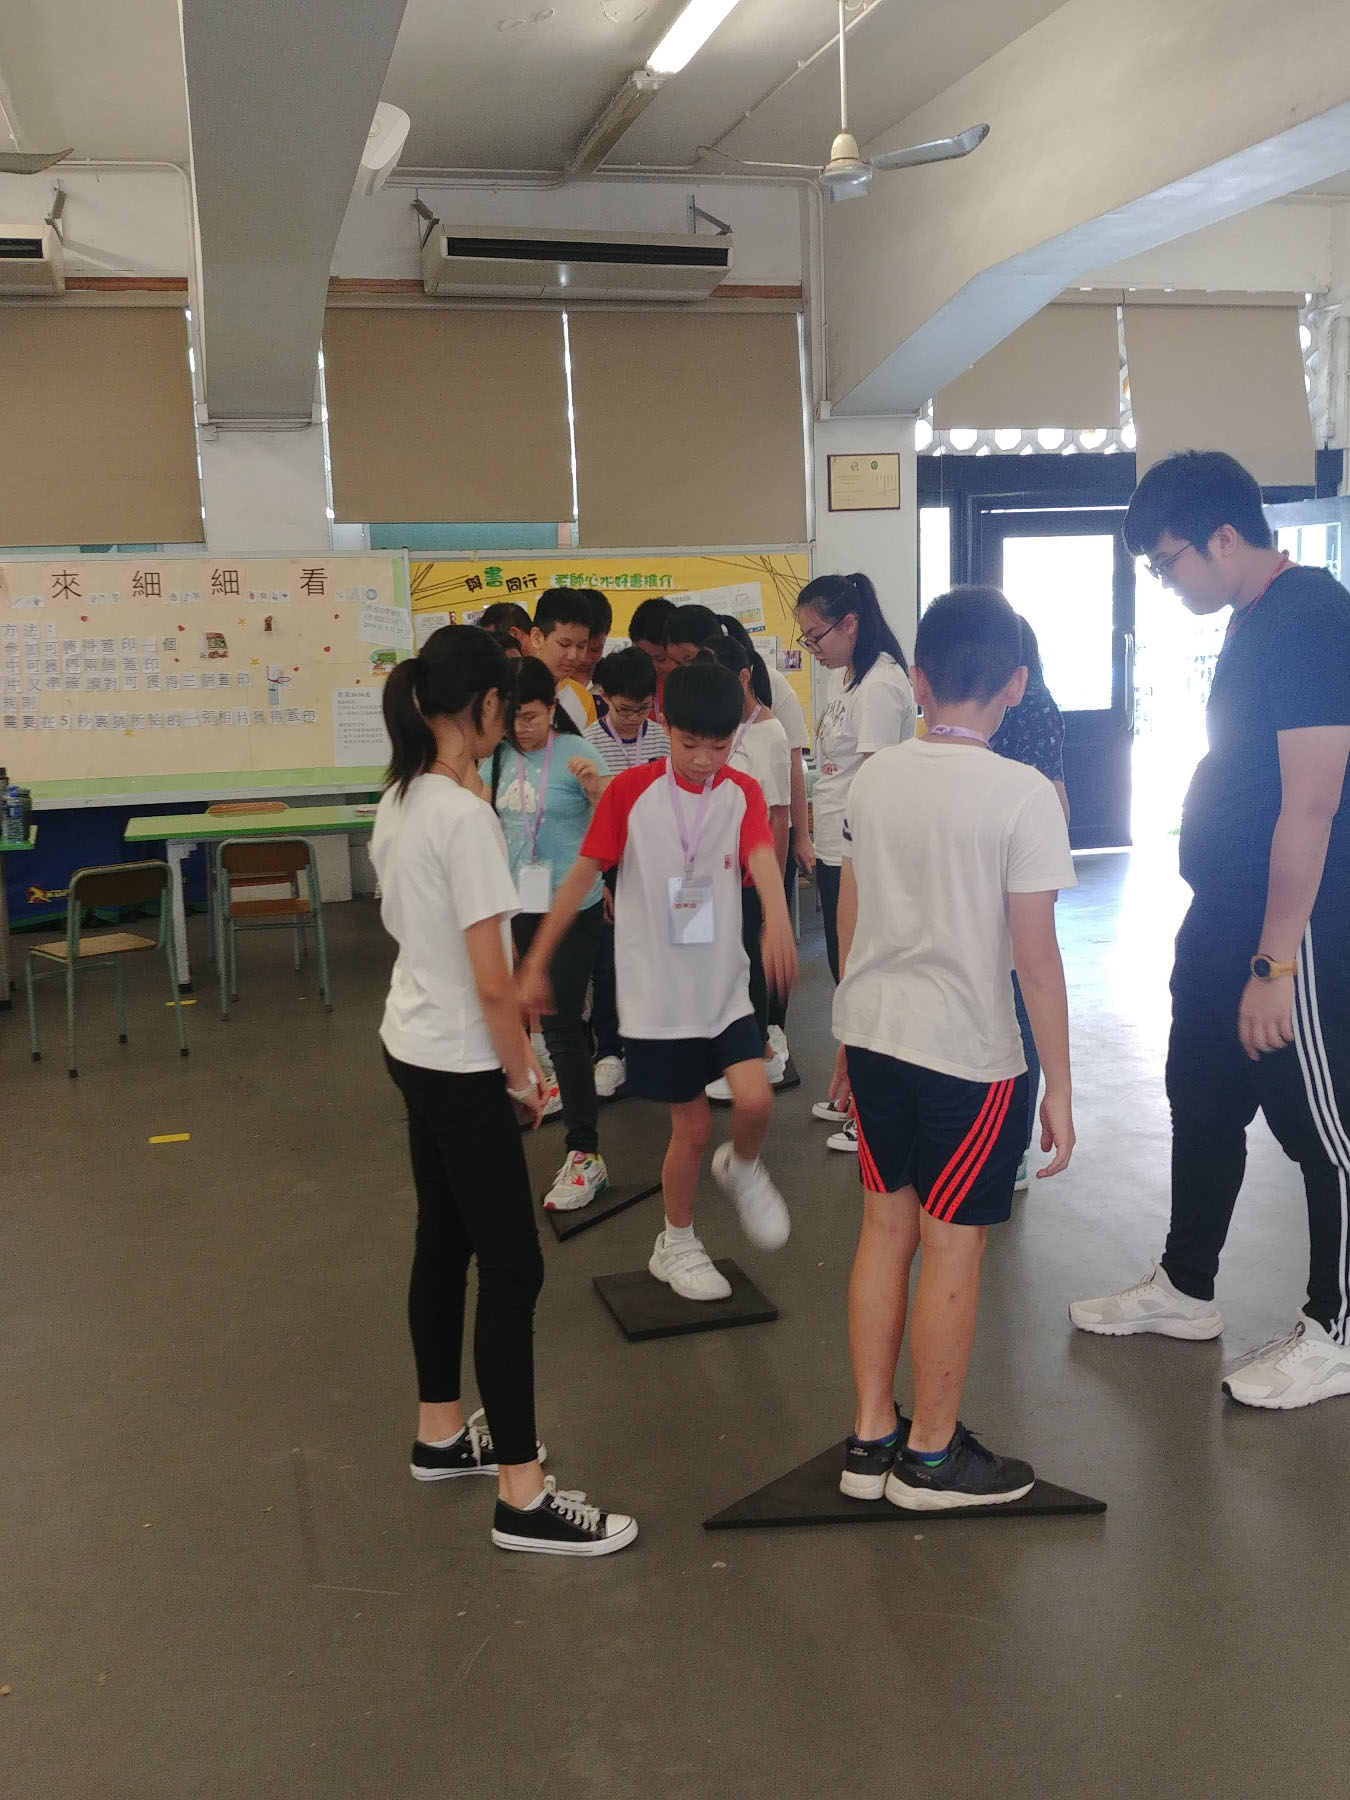 https://npc.edu.hk/sites/default/files/20190814_104916.jpg